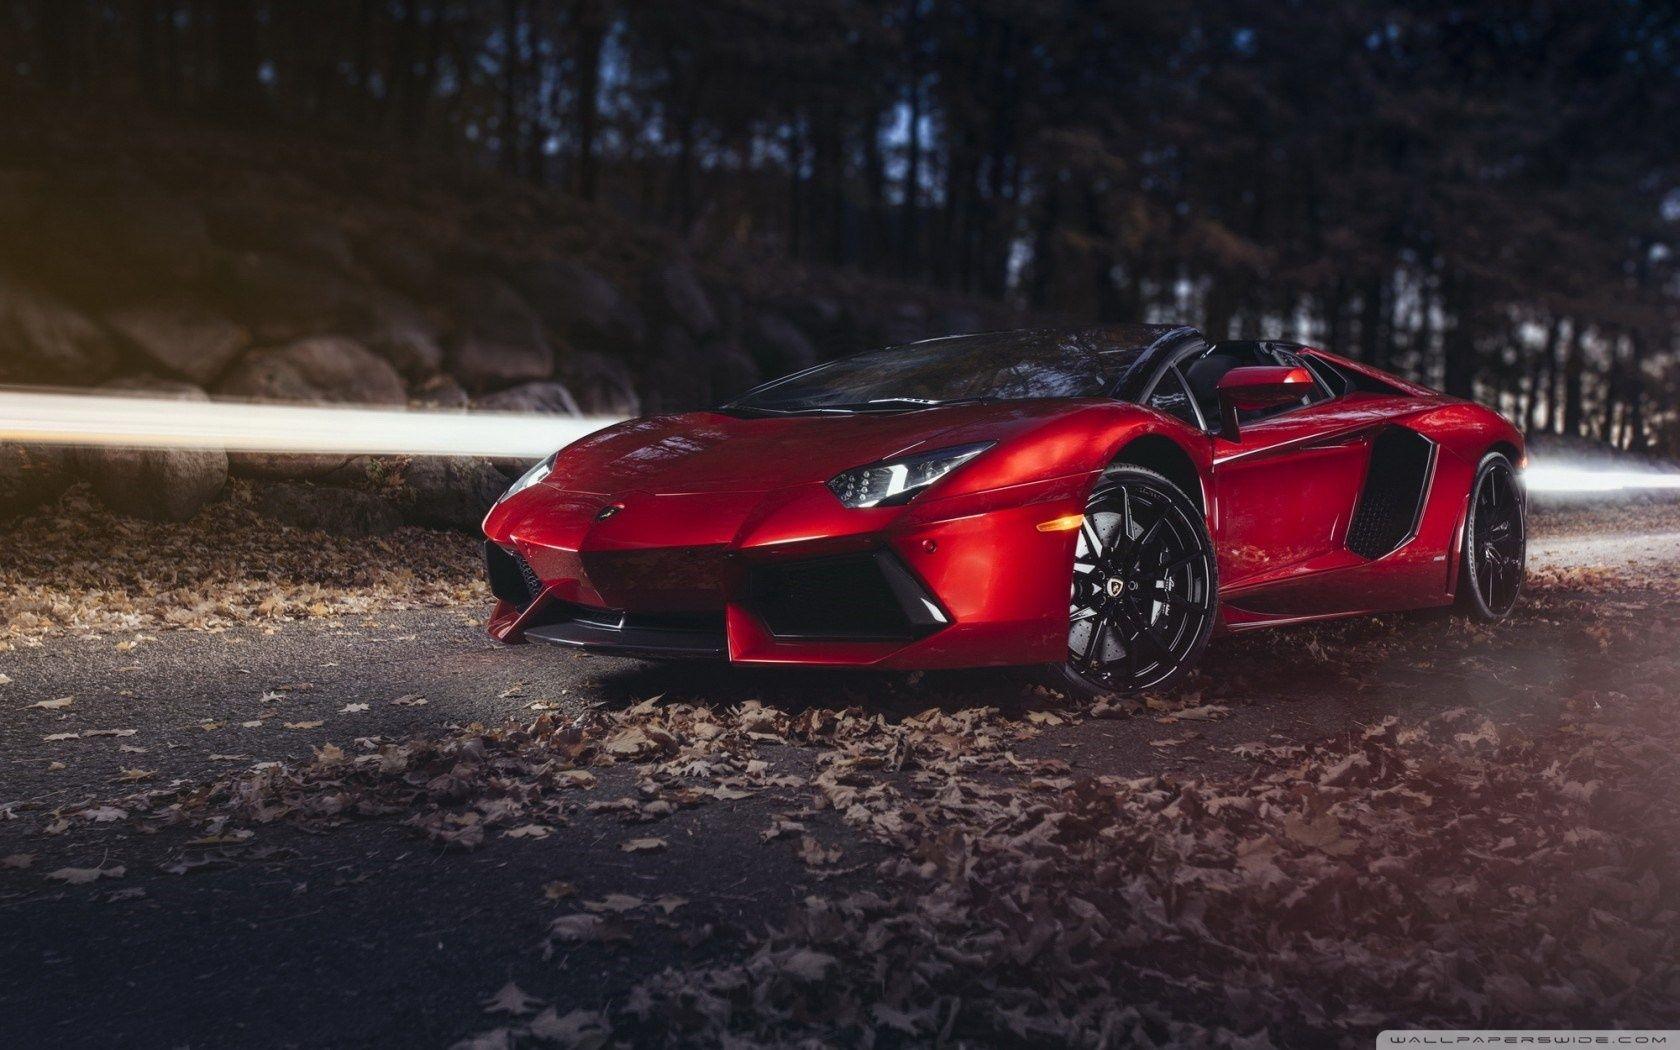 Lamborghini Transformers 4 Wallpaper Lamborghini Aventador Super Cars Lamborghini Aventador Roadster